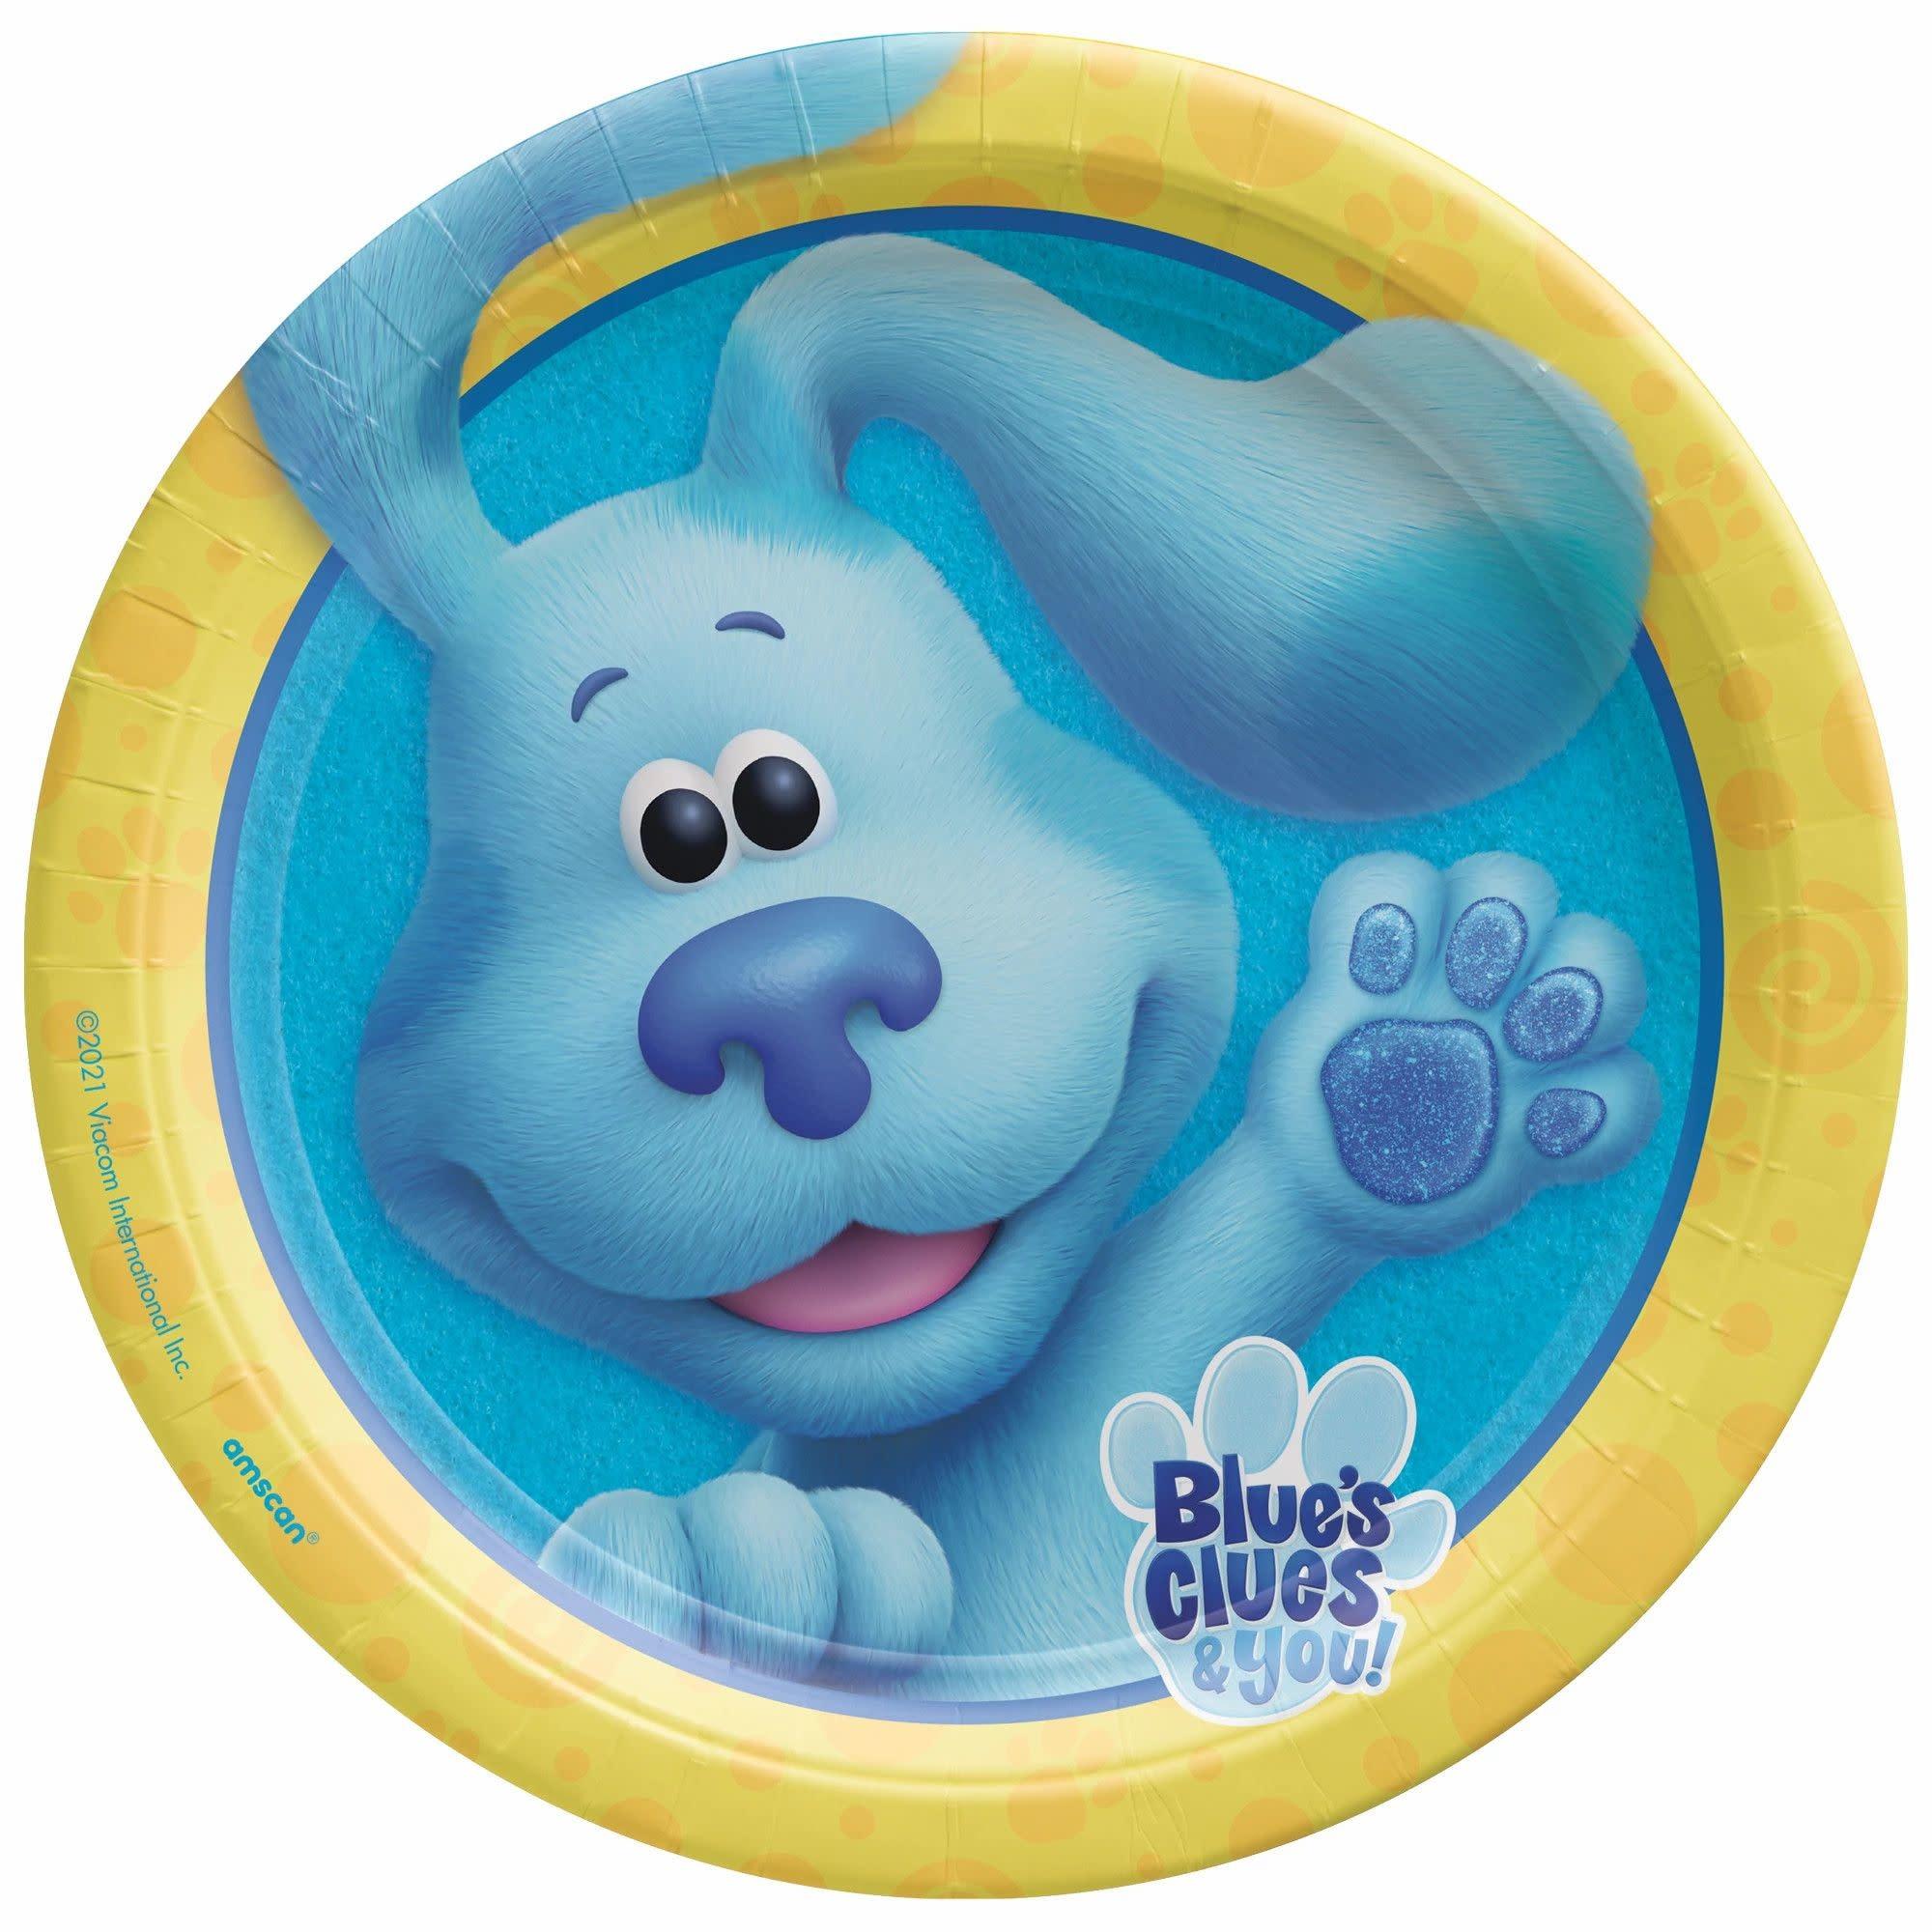 "Blues Clues 9"" Round Plates"